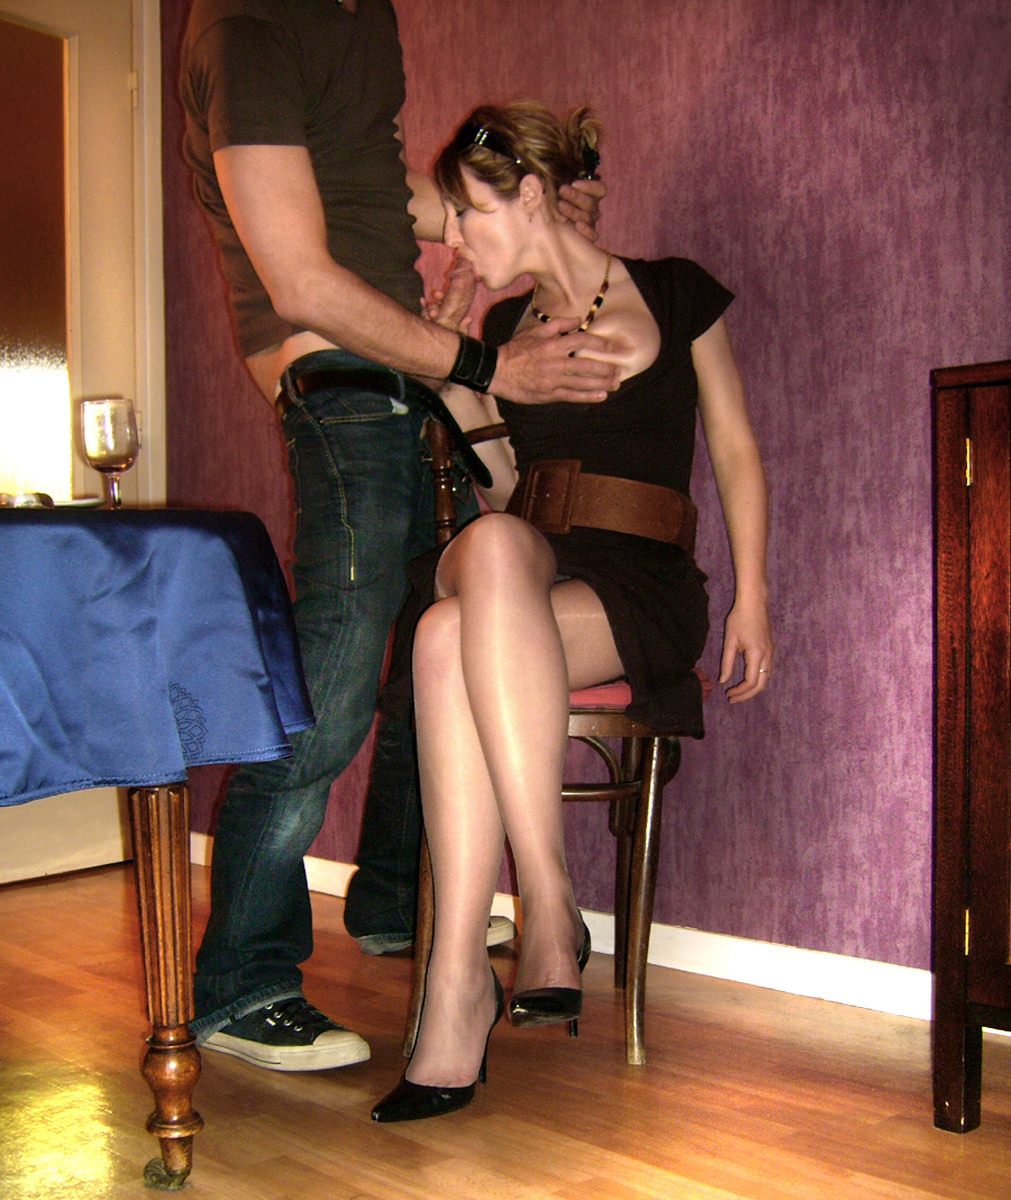 zarina sex tube fuck free porn videos zarina movies #classy #milf